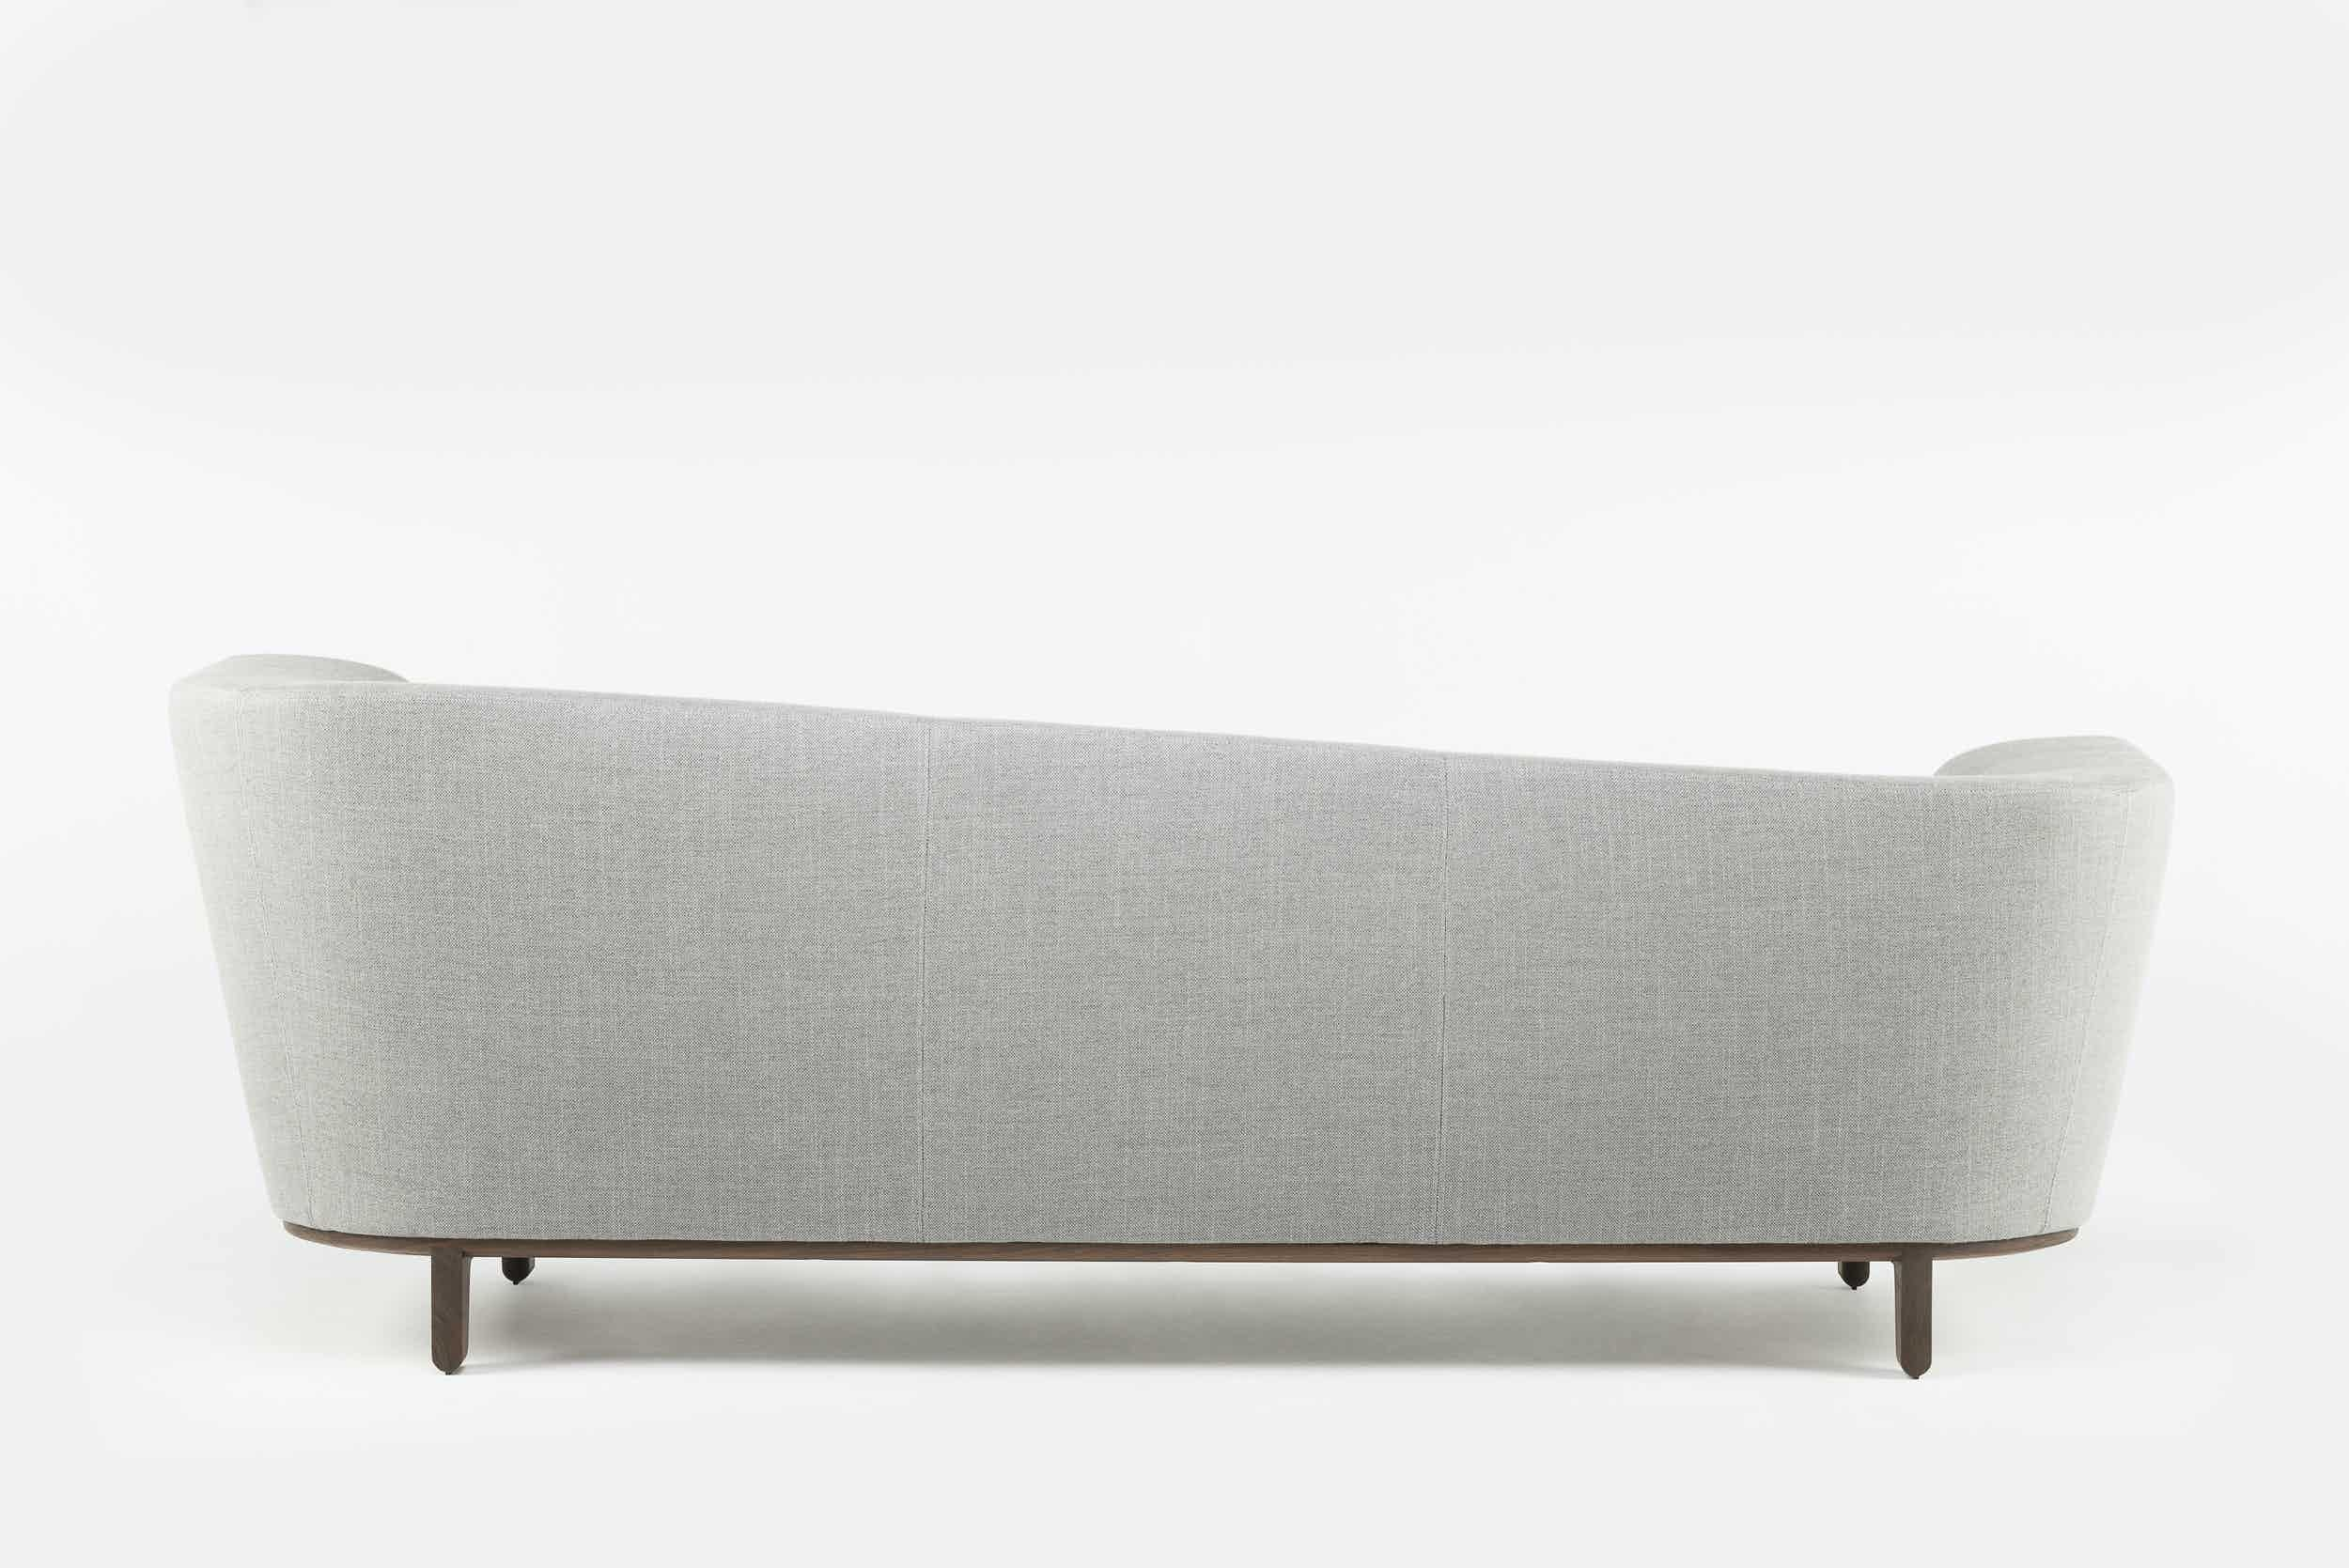 De La Espada Matthew Hilton Otley Sofa Back Haute Living